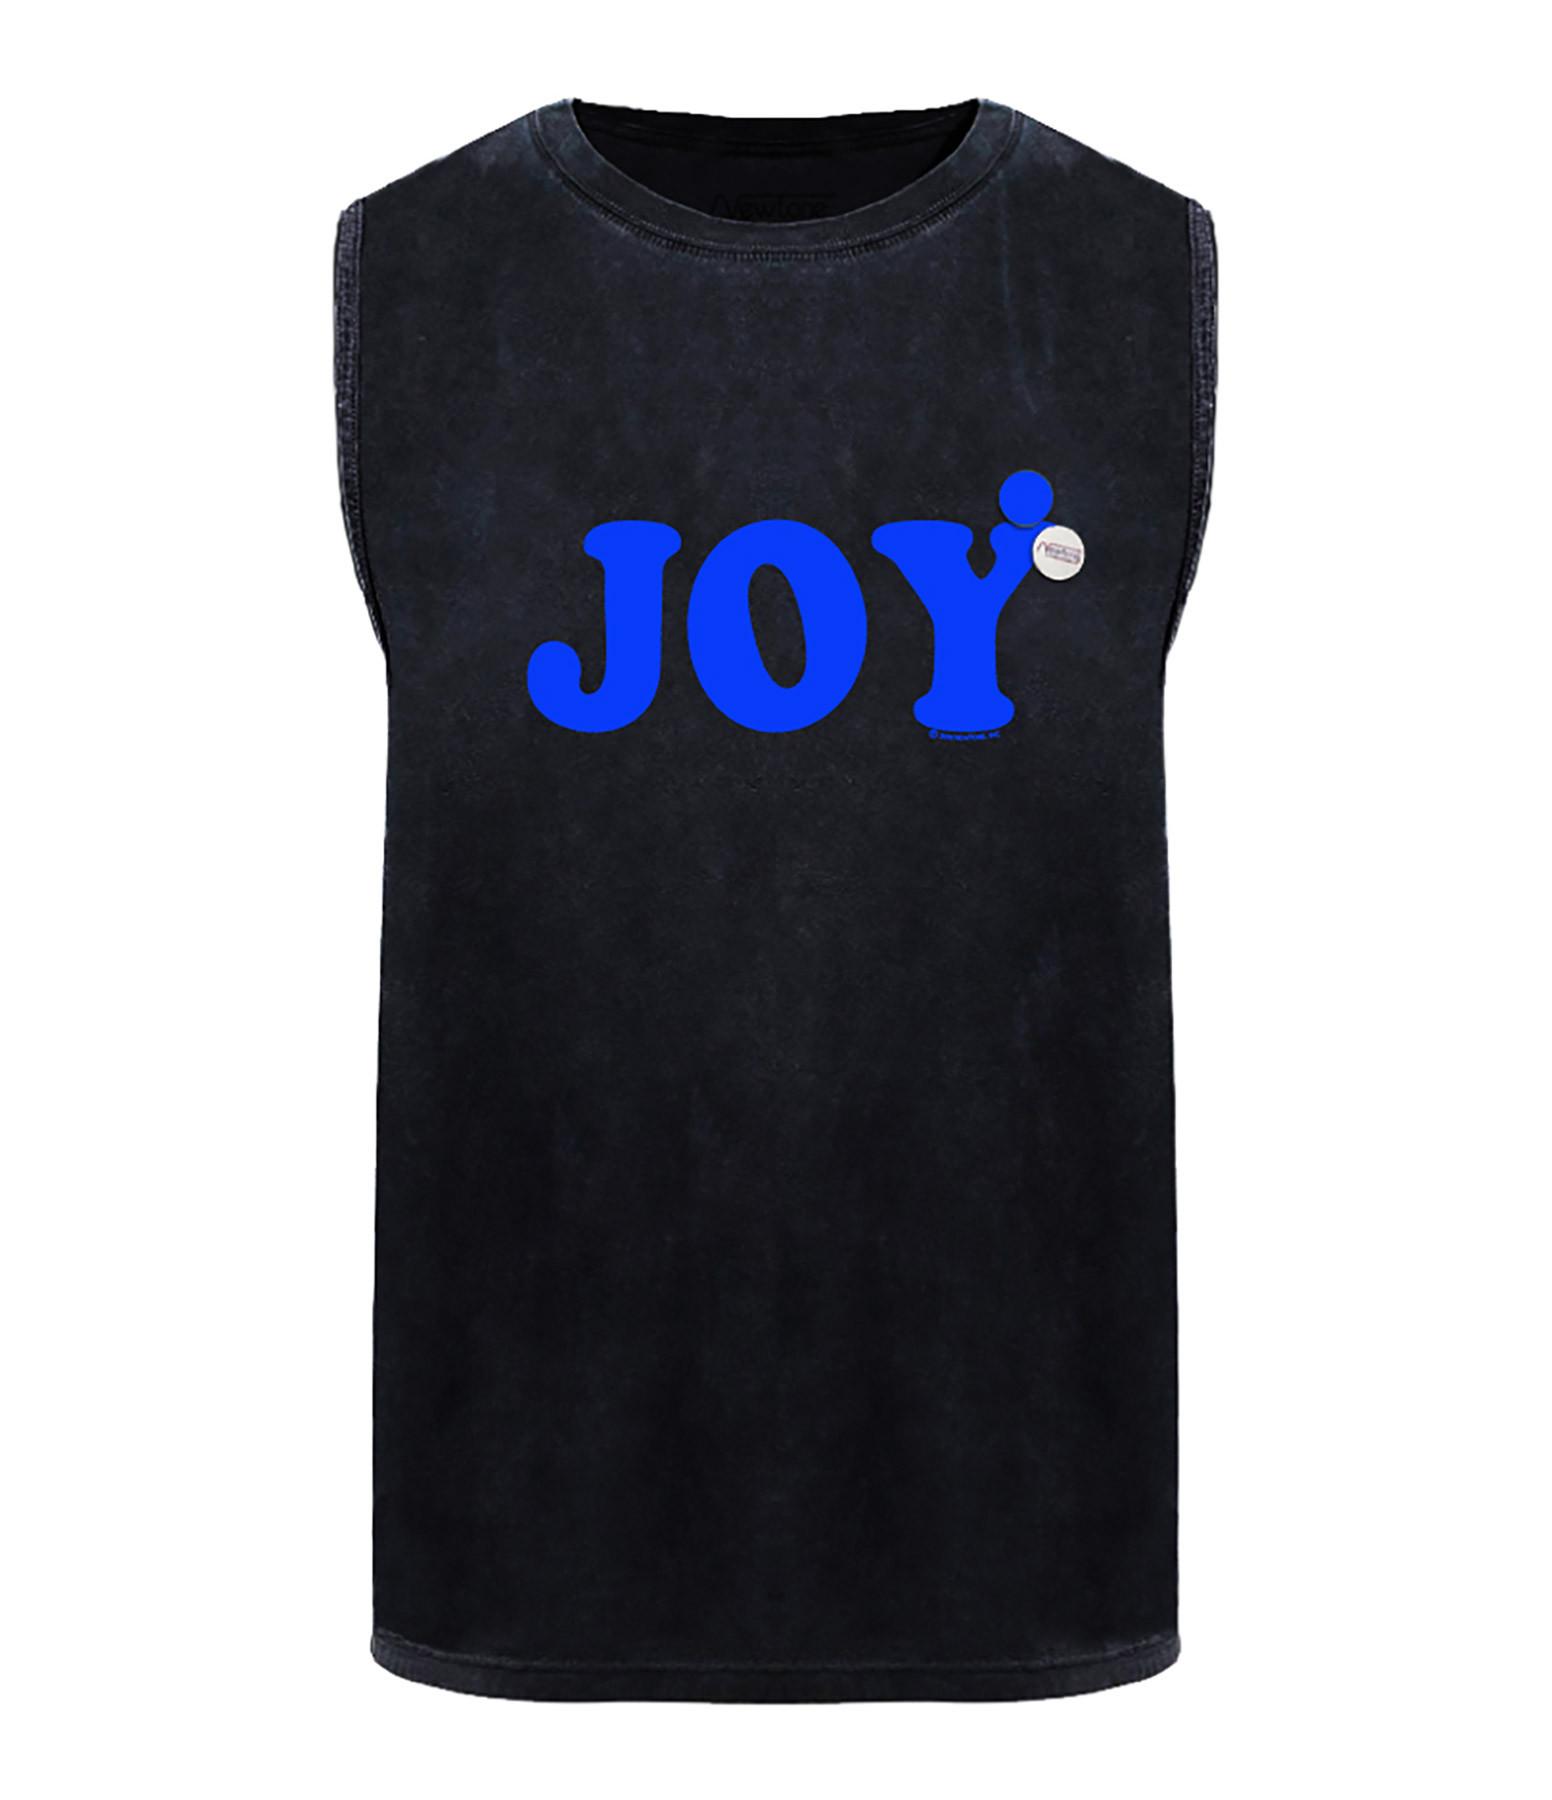 NEWTONE - Tee-shirt Biker Joy Coton Noir